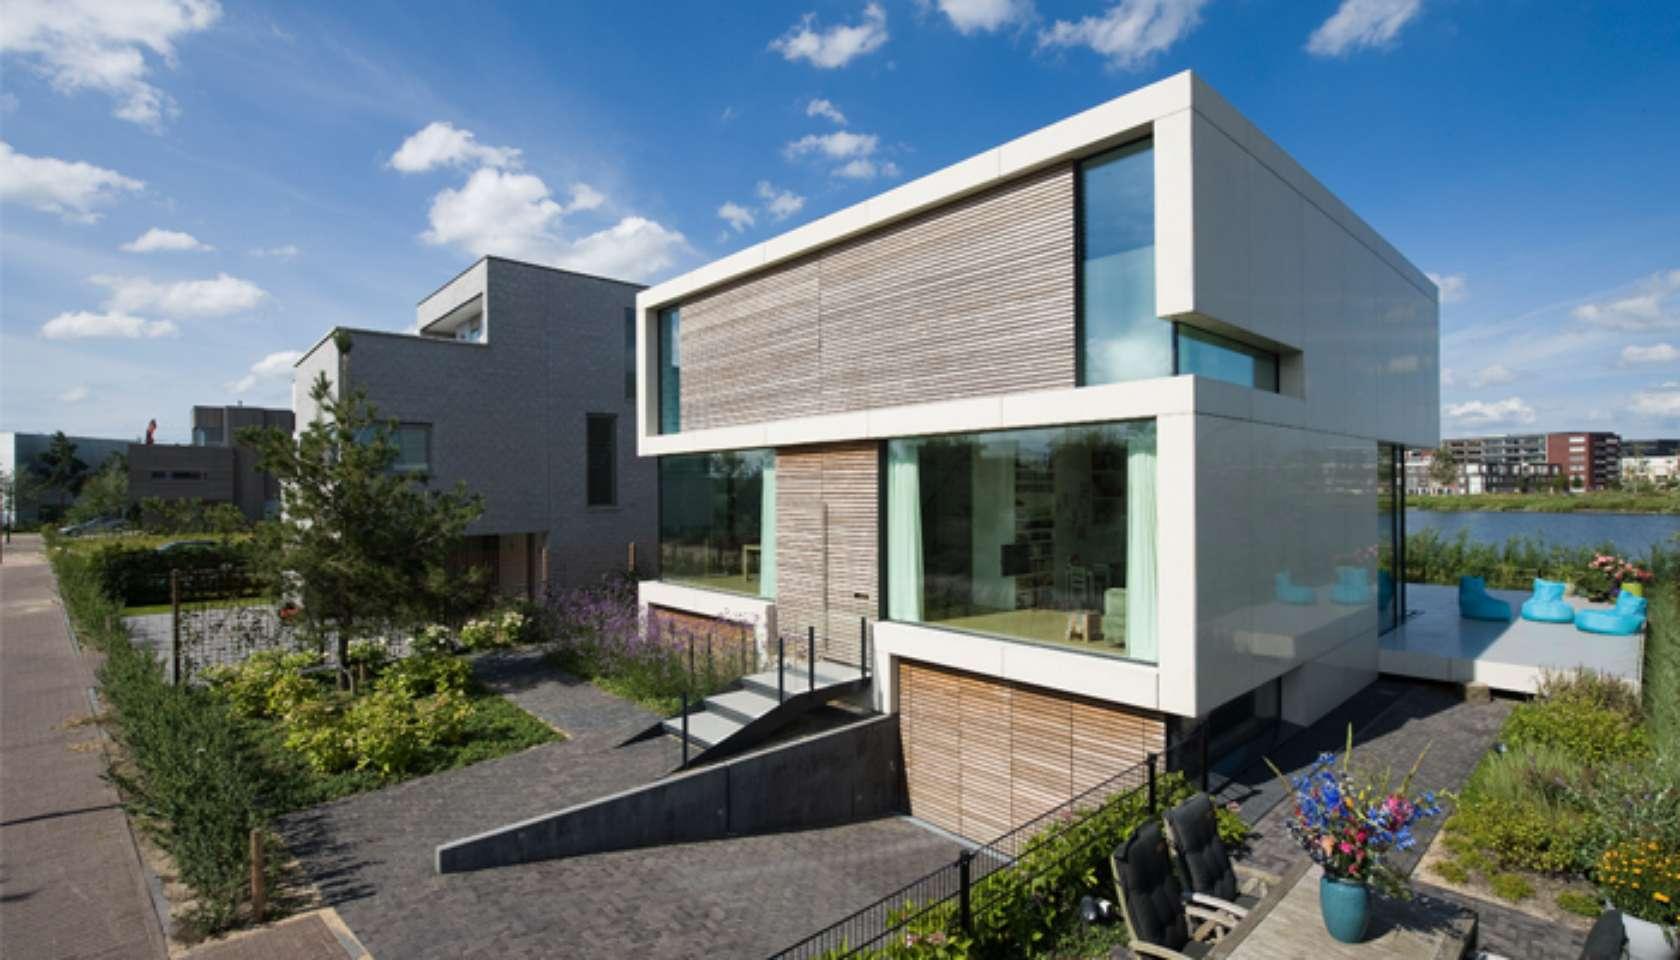 Villa s2 ijburg in amsterdam architizer - Apartamentos en amsterdam ...